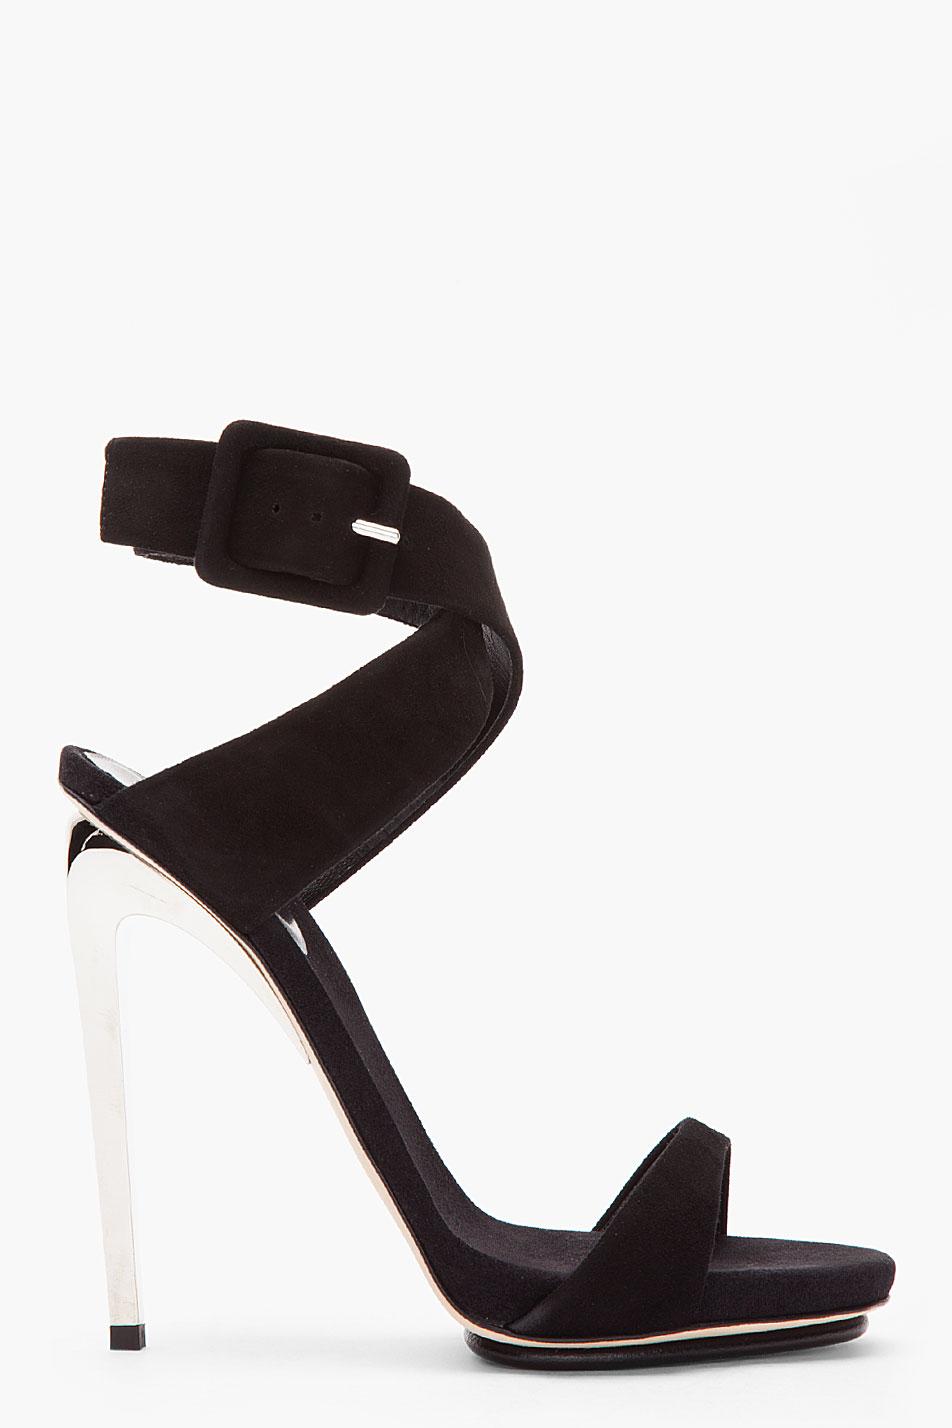 067e83a91ac Lyst - Giuseppe Zanotti Black Suede and Silver Alien 115 Heels in Black